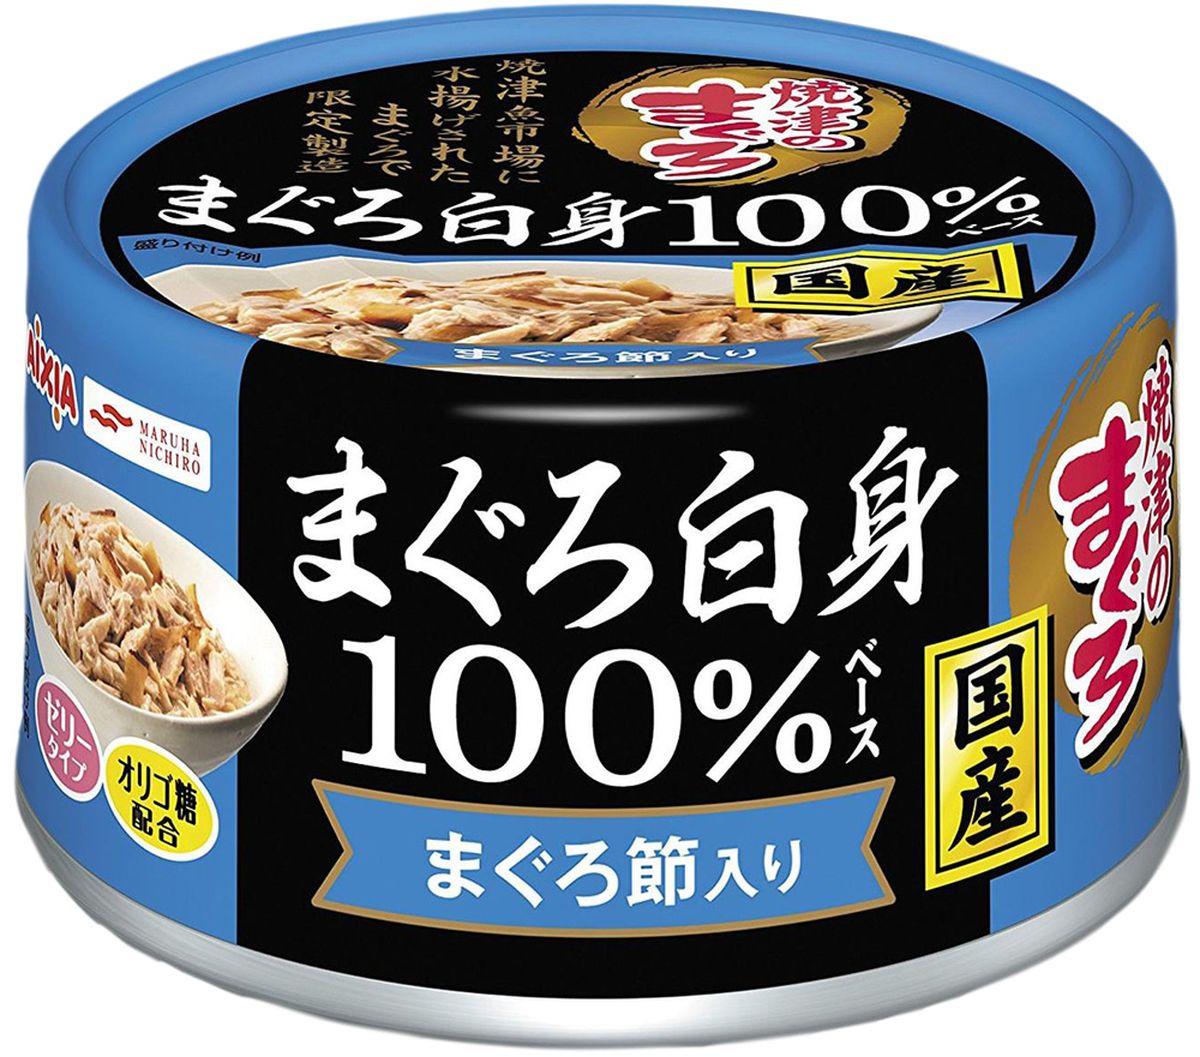 Корм консервированный для кошек Aixia Yaizu-no-Maguro White Meat 100%, тунец и сушеный тунец, 70 г